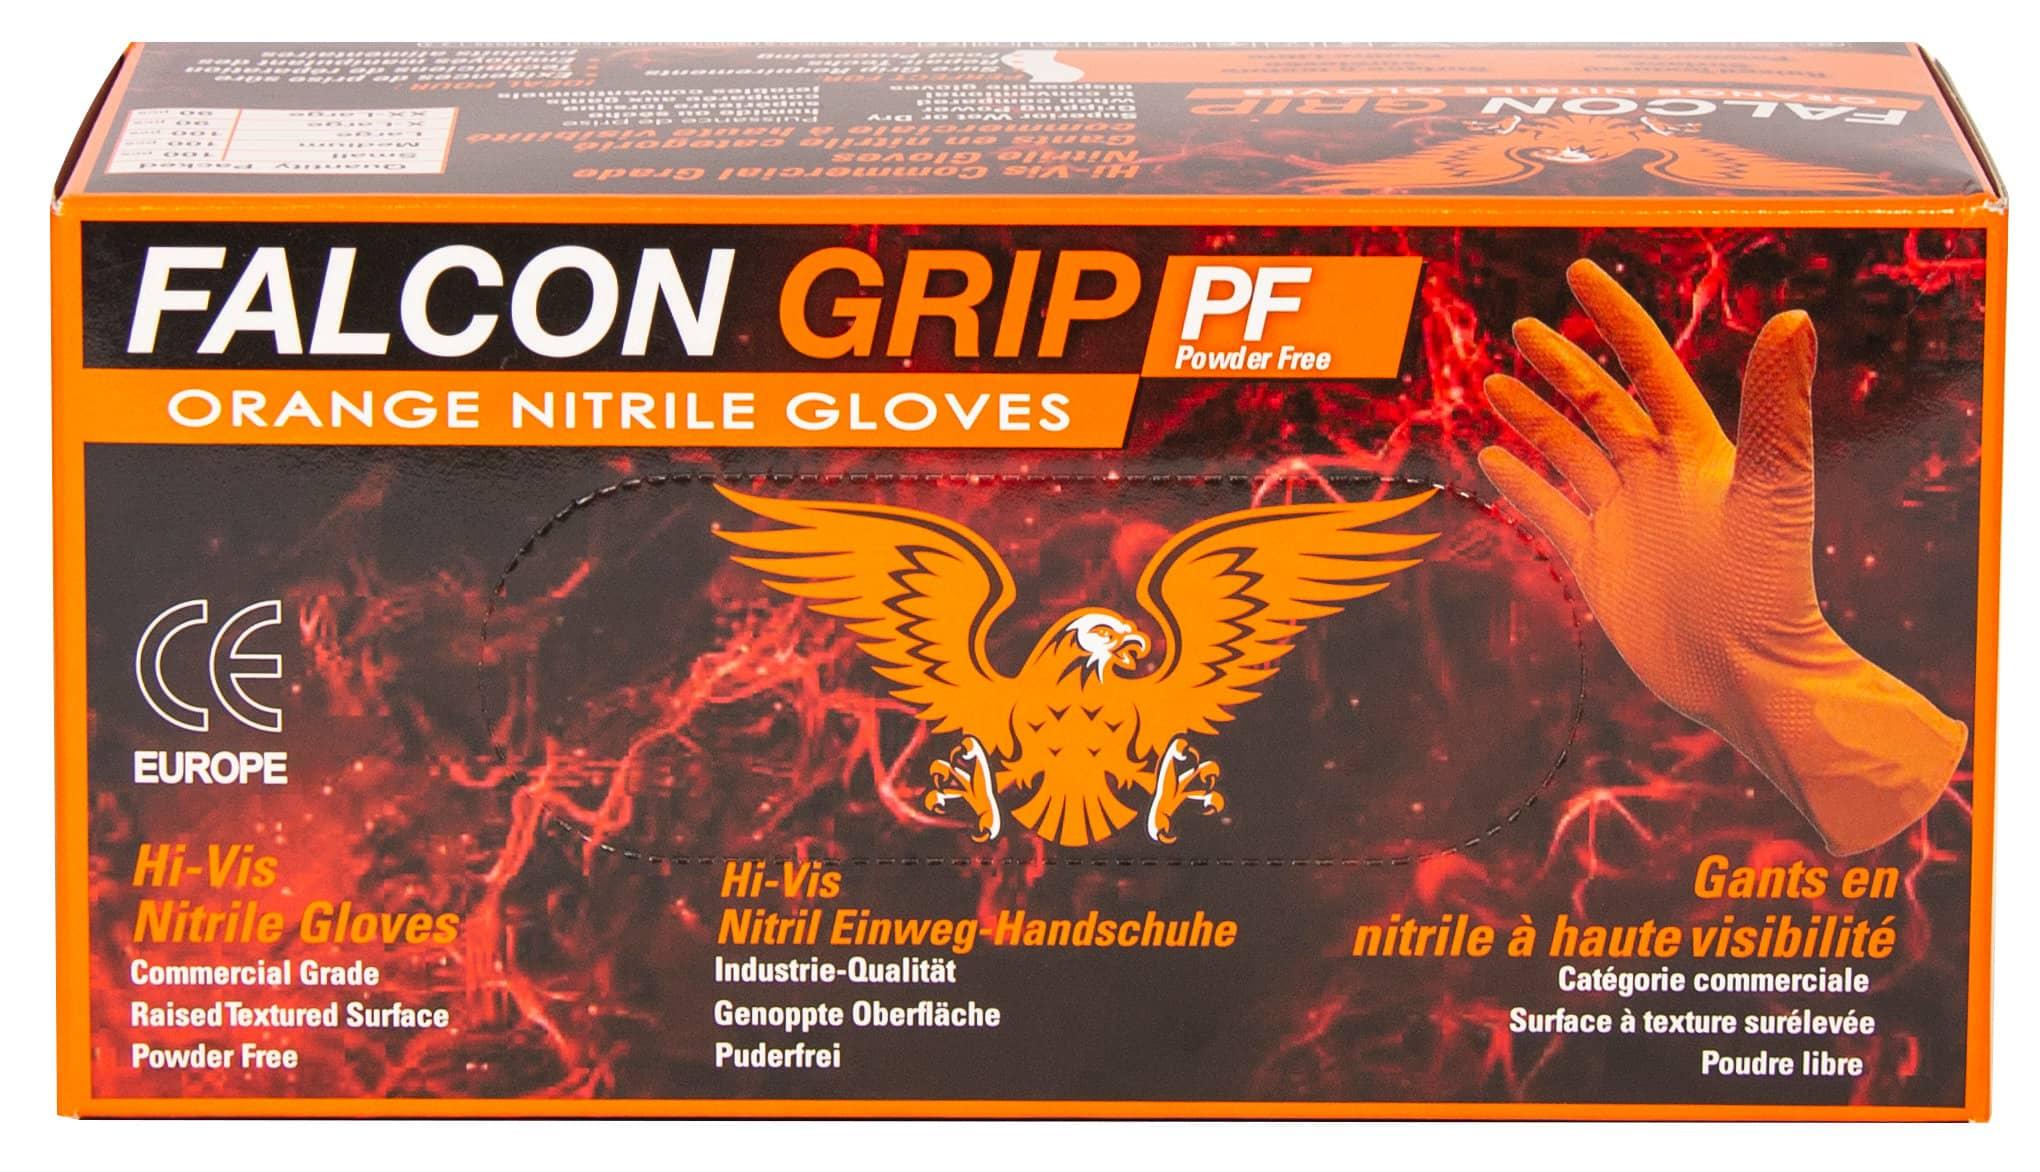 Falcon Grip Nitrilhandschuhe